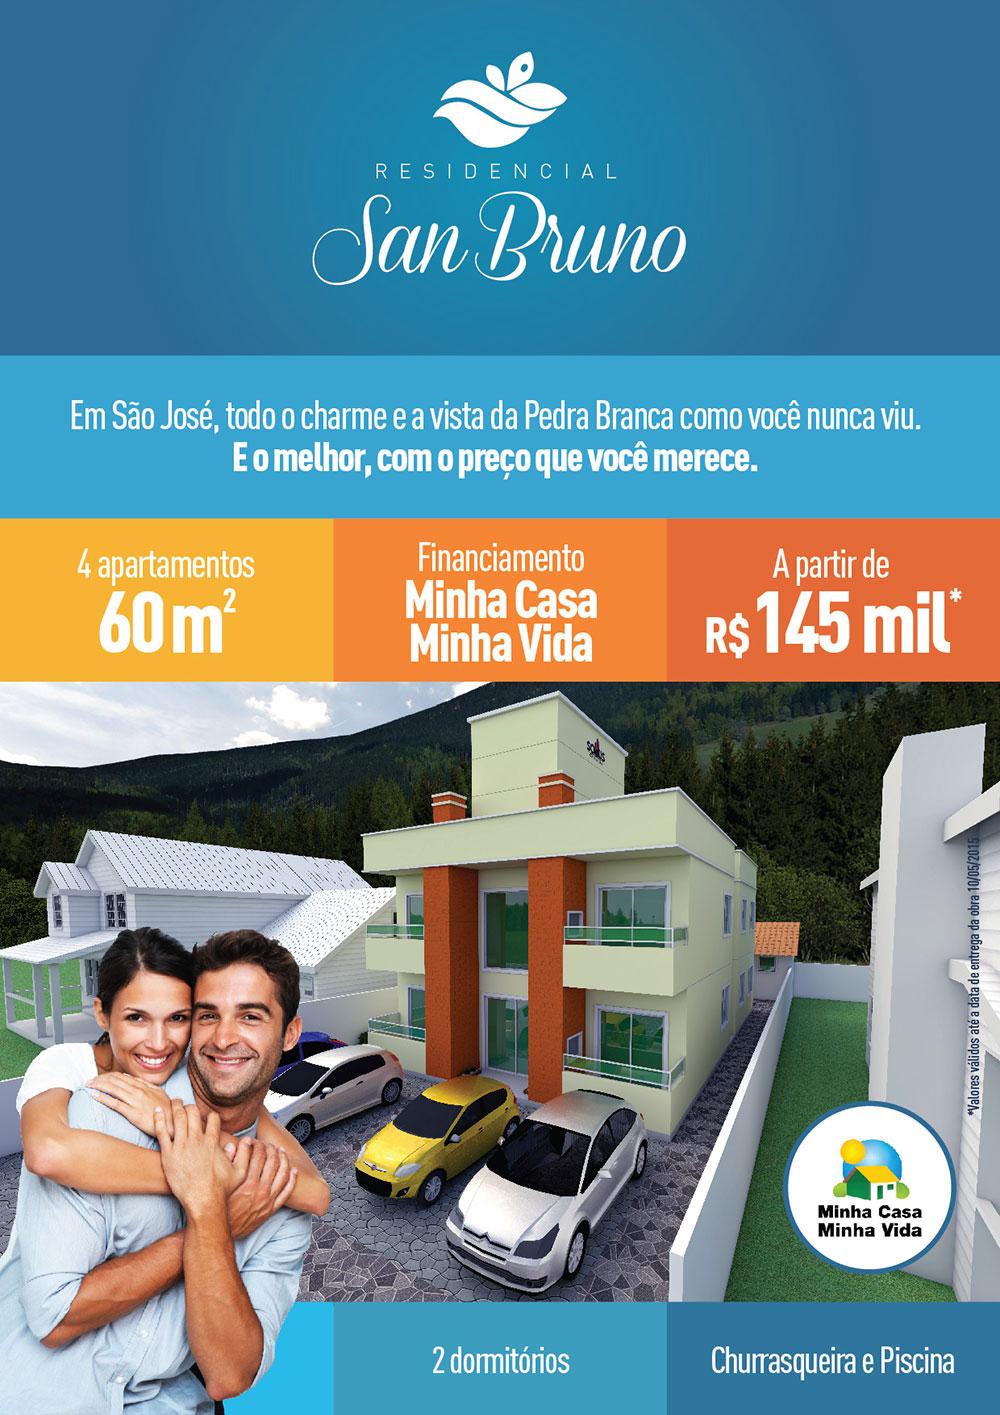 Sollus SC Empreendimentos e Reformas Residencial San Bruno Grande Florianópolis